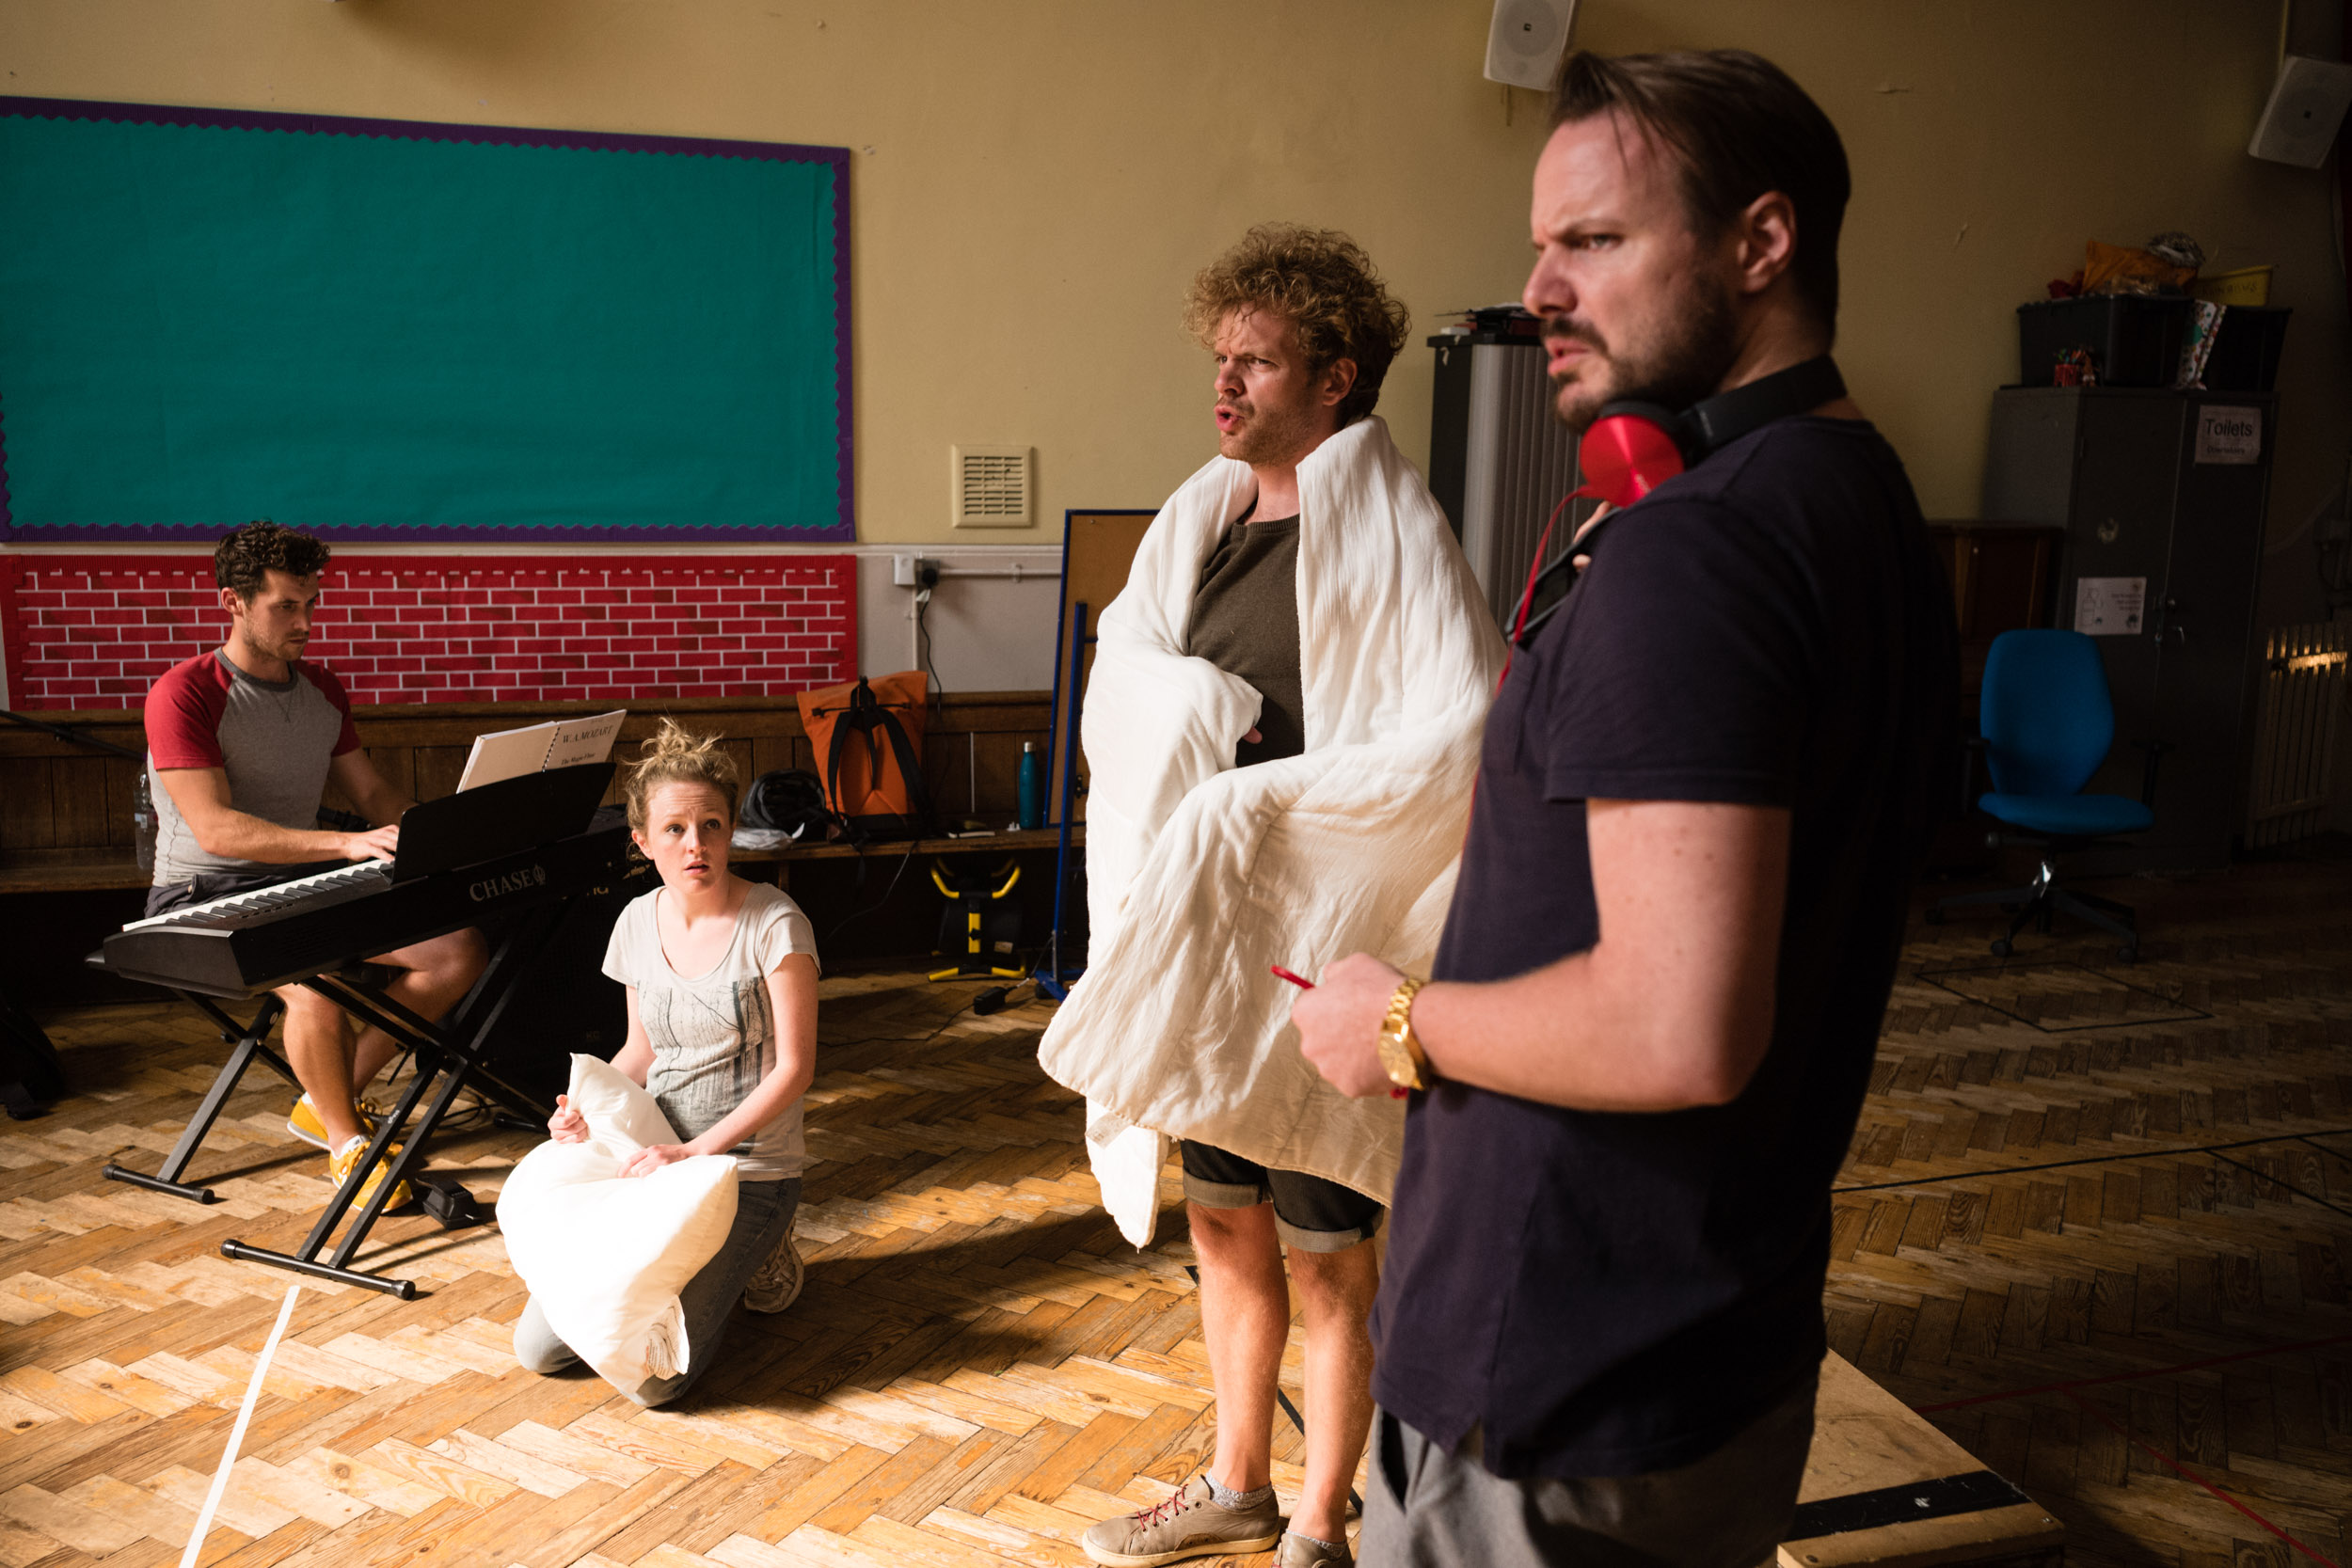 From Left: David Keefe (Musical Director), Susanna Buckle (Pamina), Peter Kirk (Tamino), Tom Stoddart (Papageno)